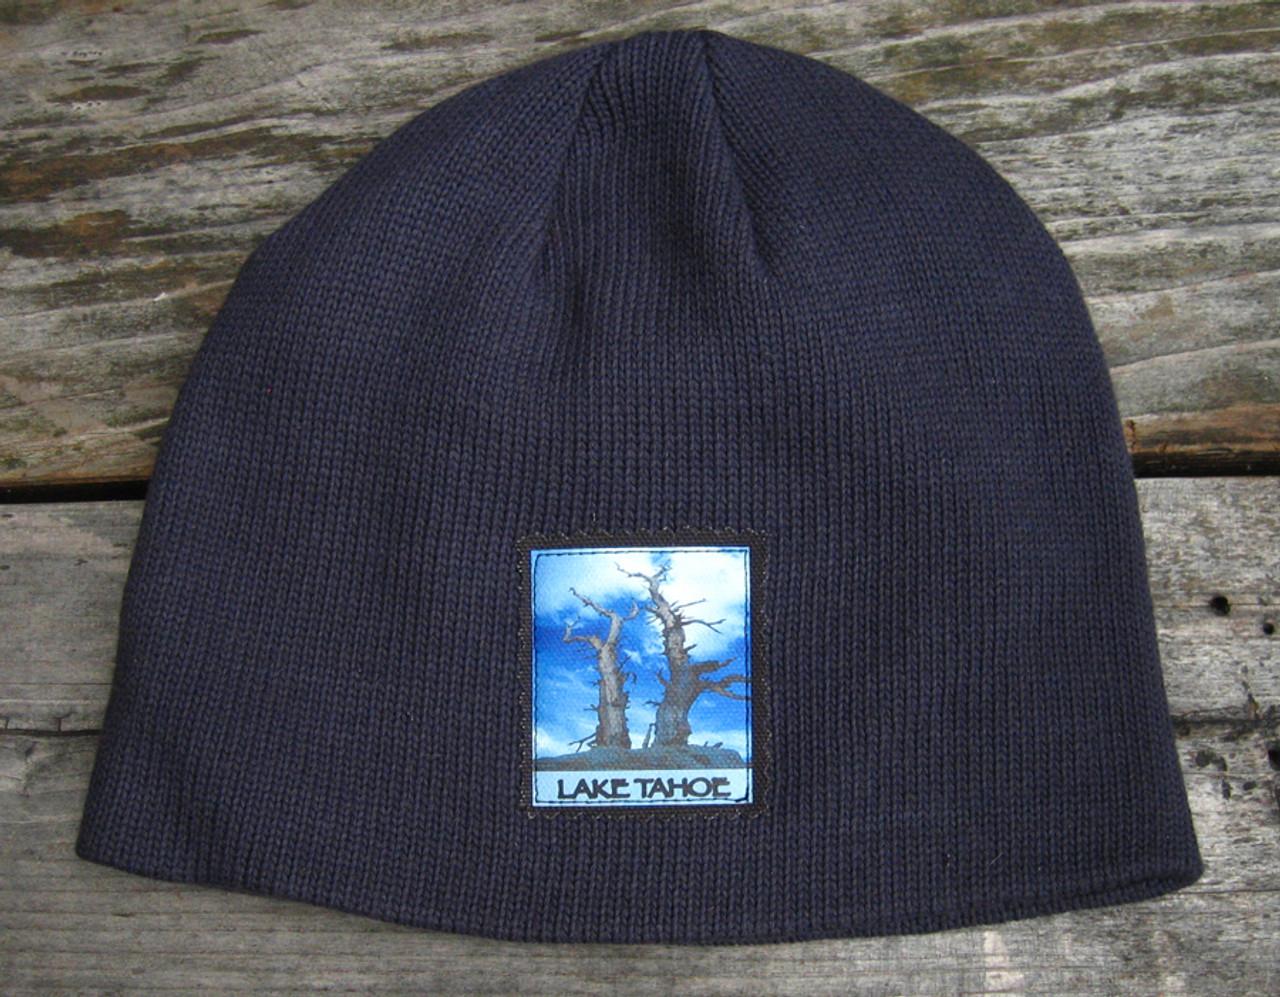 719b4199218 Snags above Lake Tahoe Organic Cotton Beanie Hat - Dharma Love